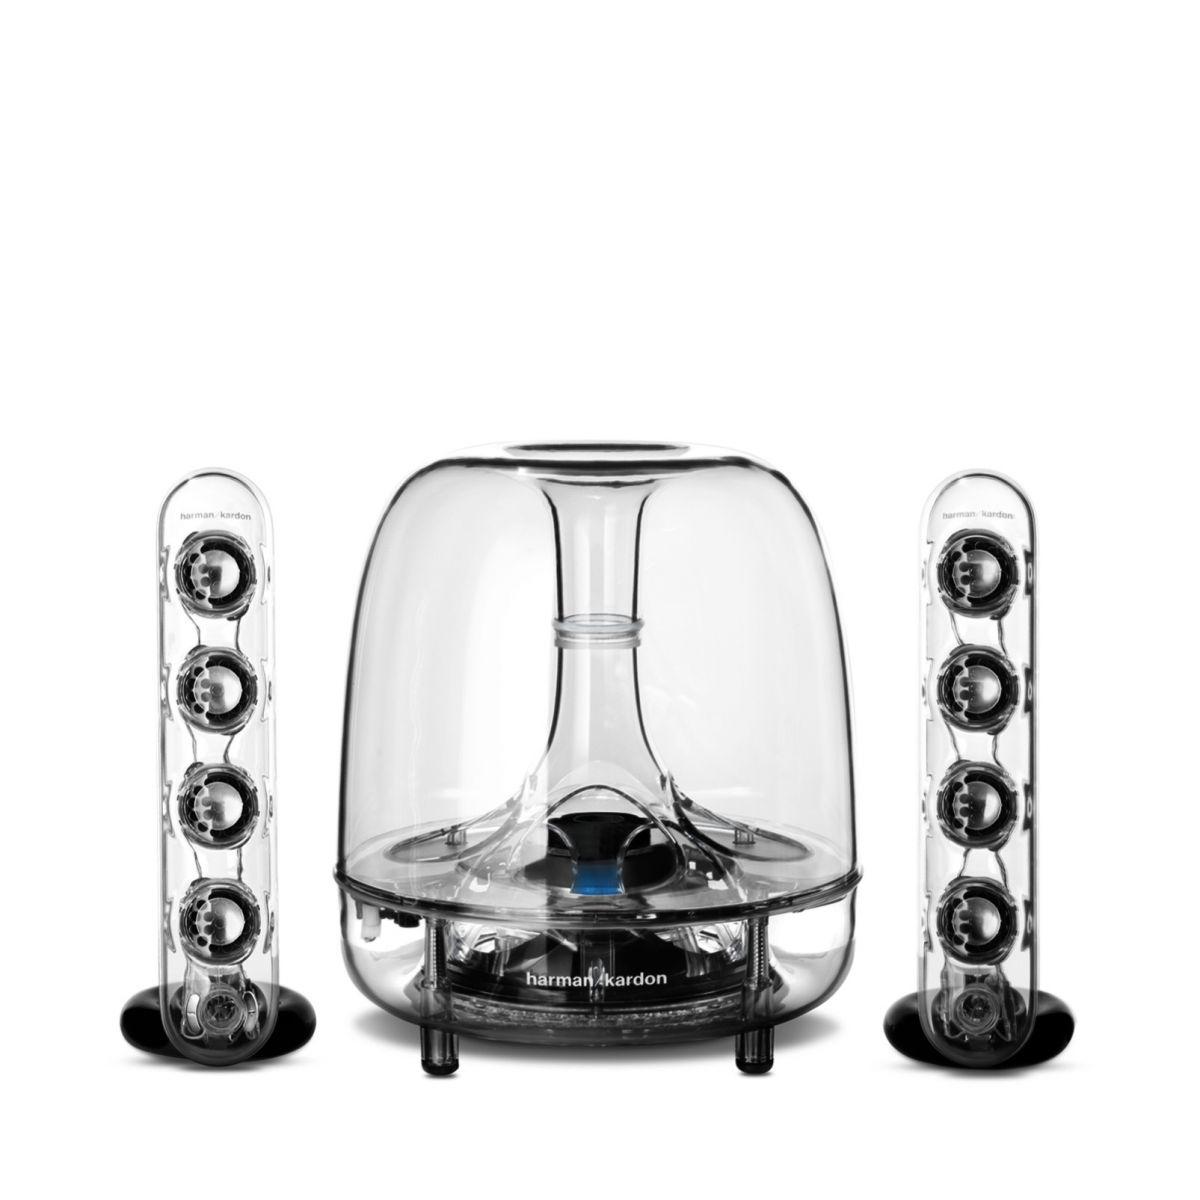 caixa de som harman kardon soundsticks bt wireless. Black Bedroom Furniture Sets. Home Design Ideas